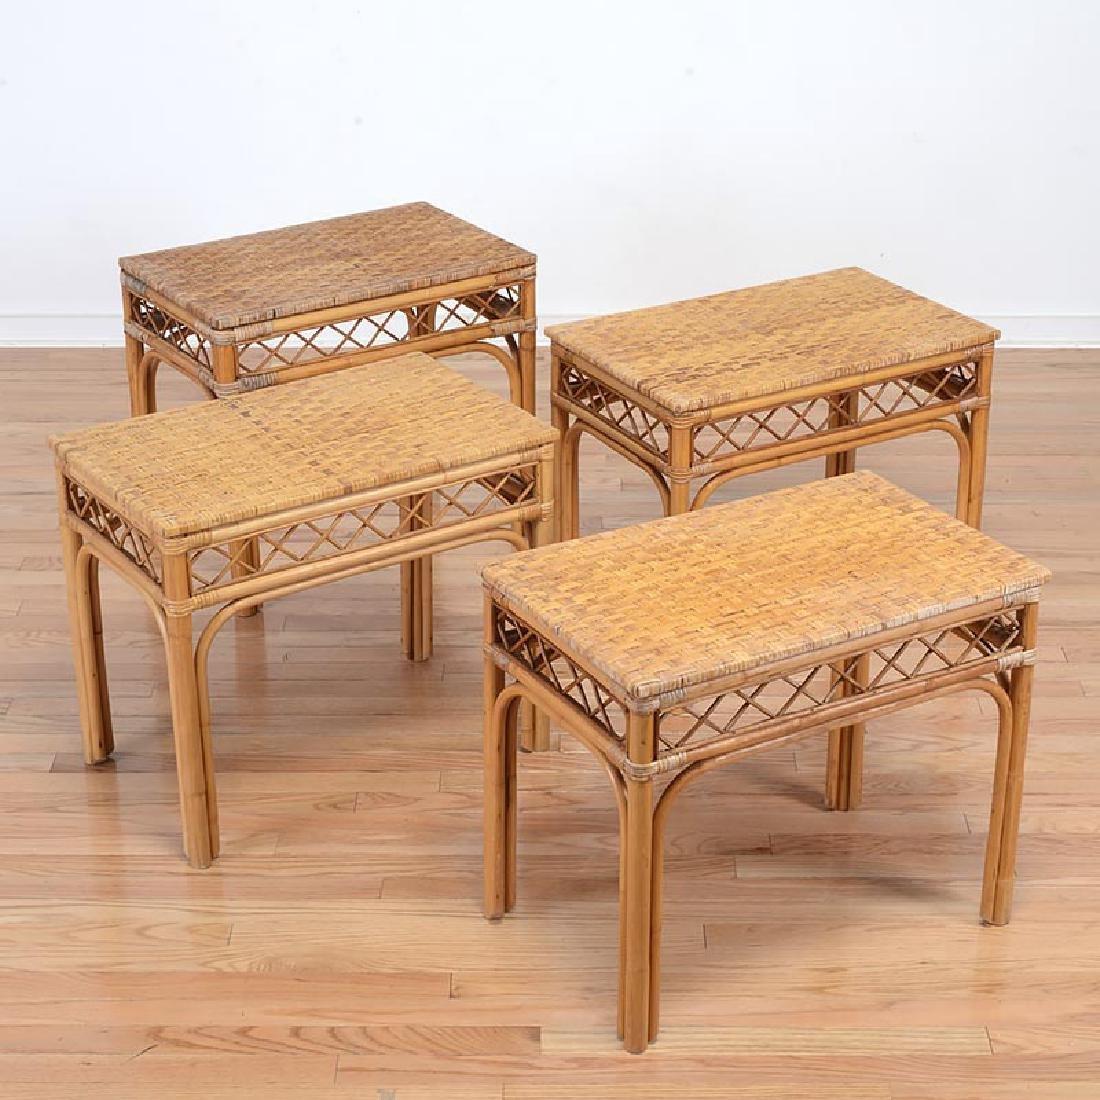 Set (4) Mid-Century rattan side tables